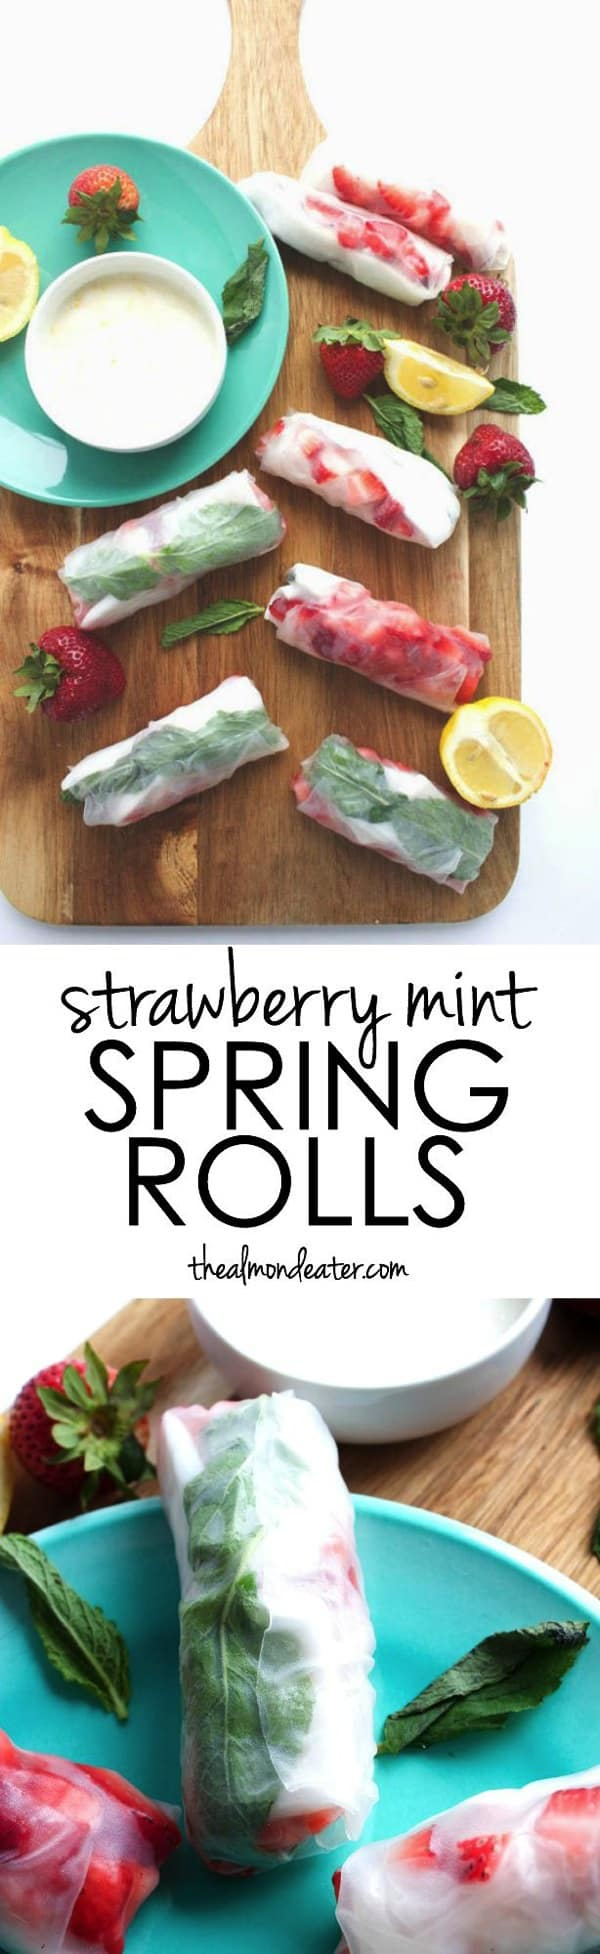 Strawberry Mint Spring Rolls 123